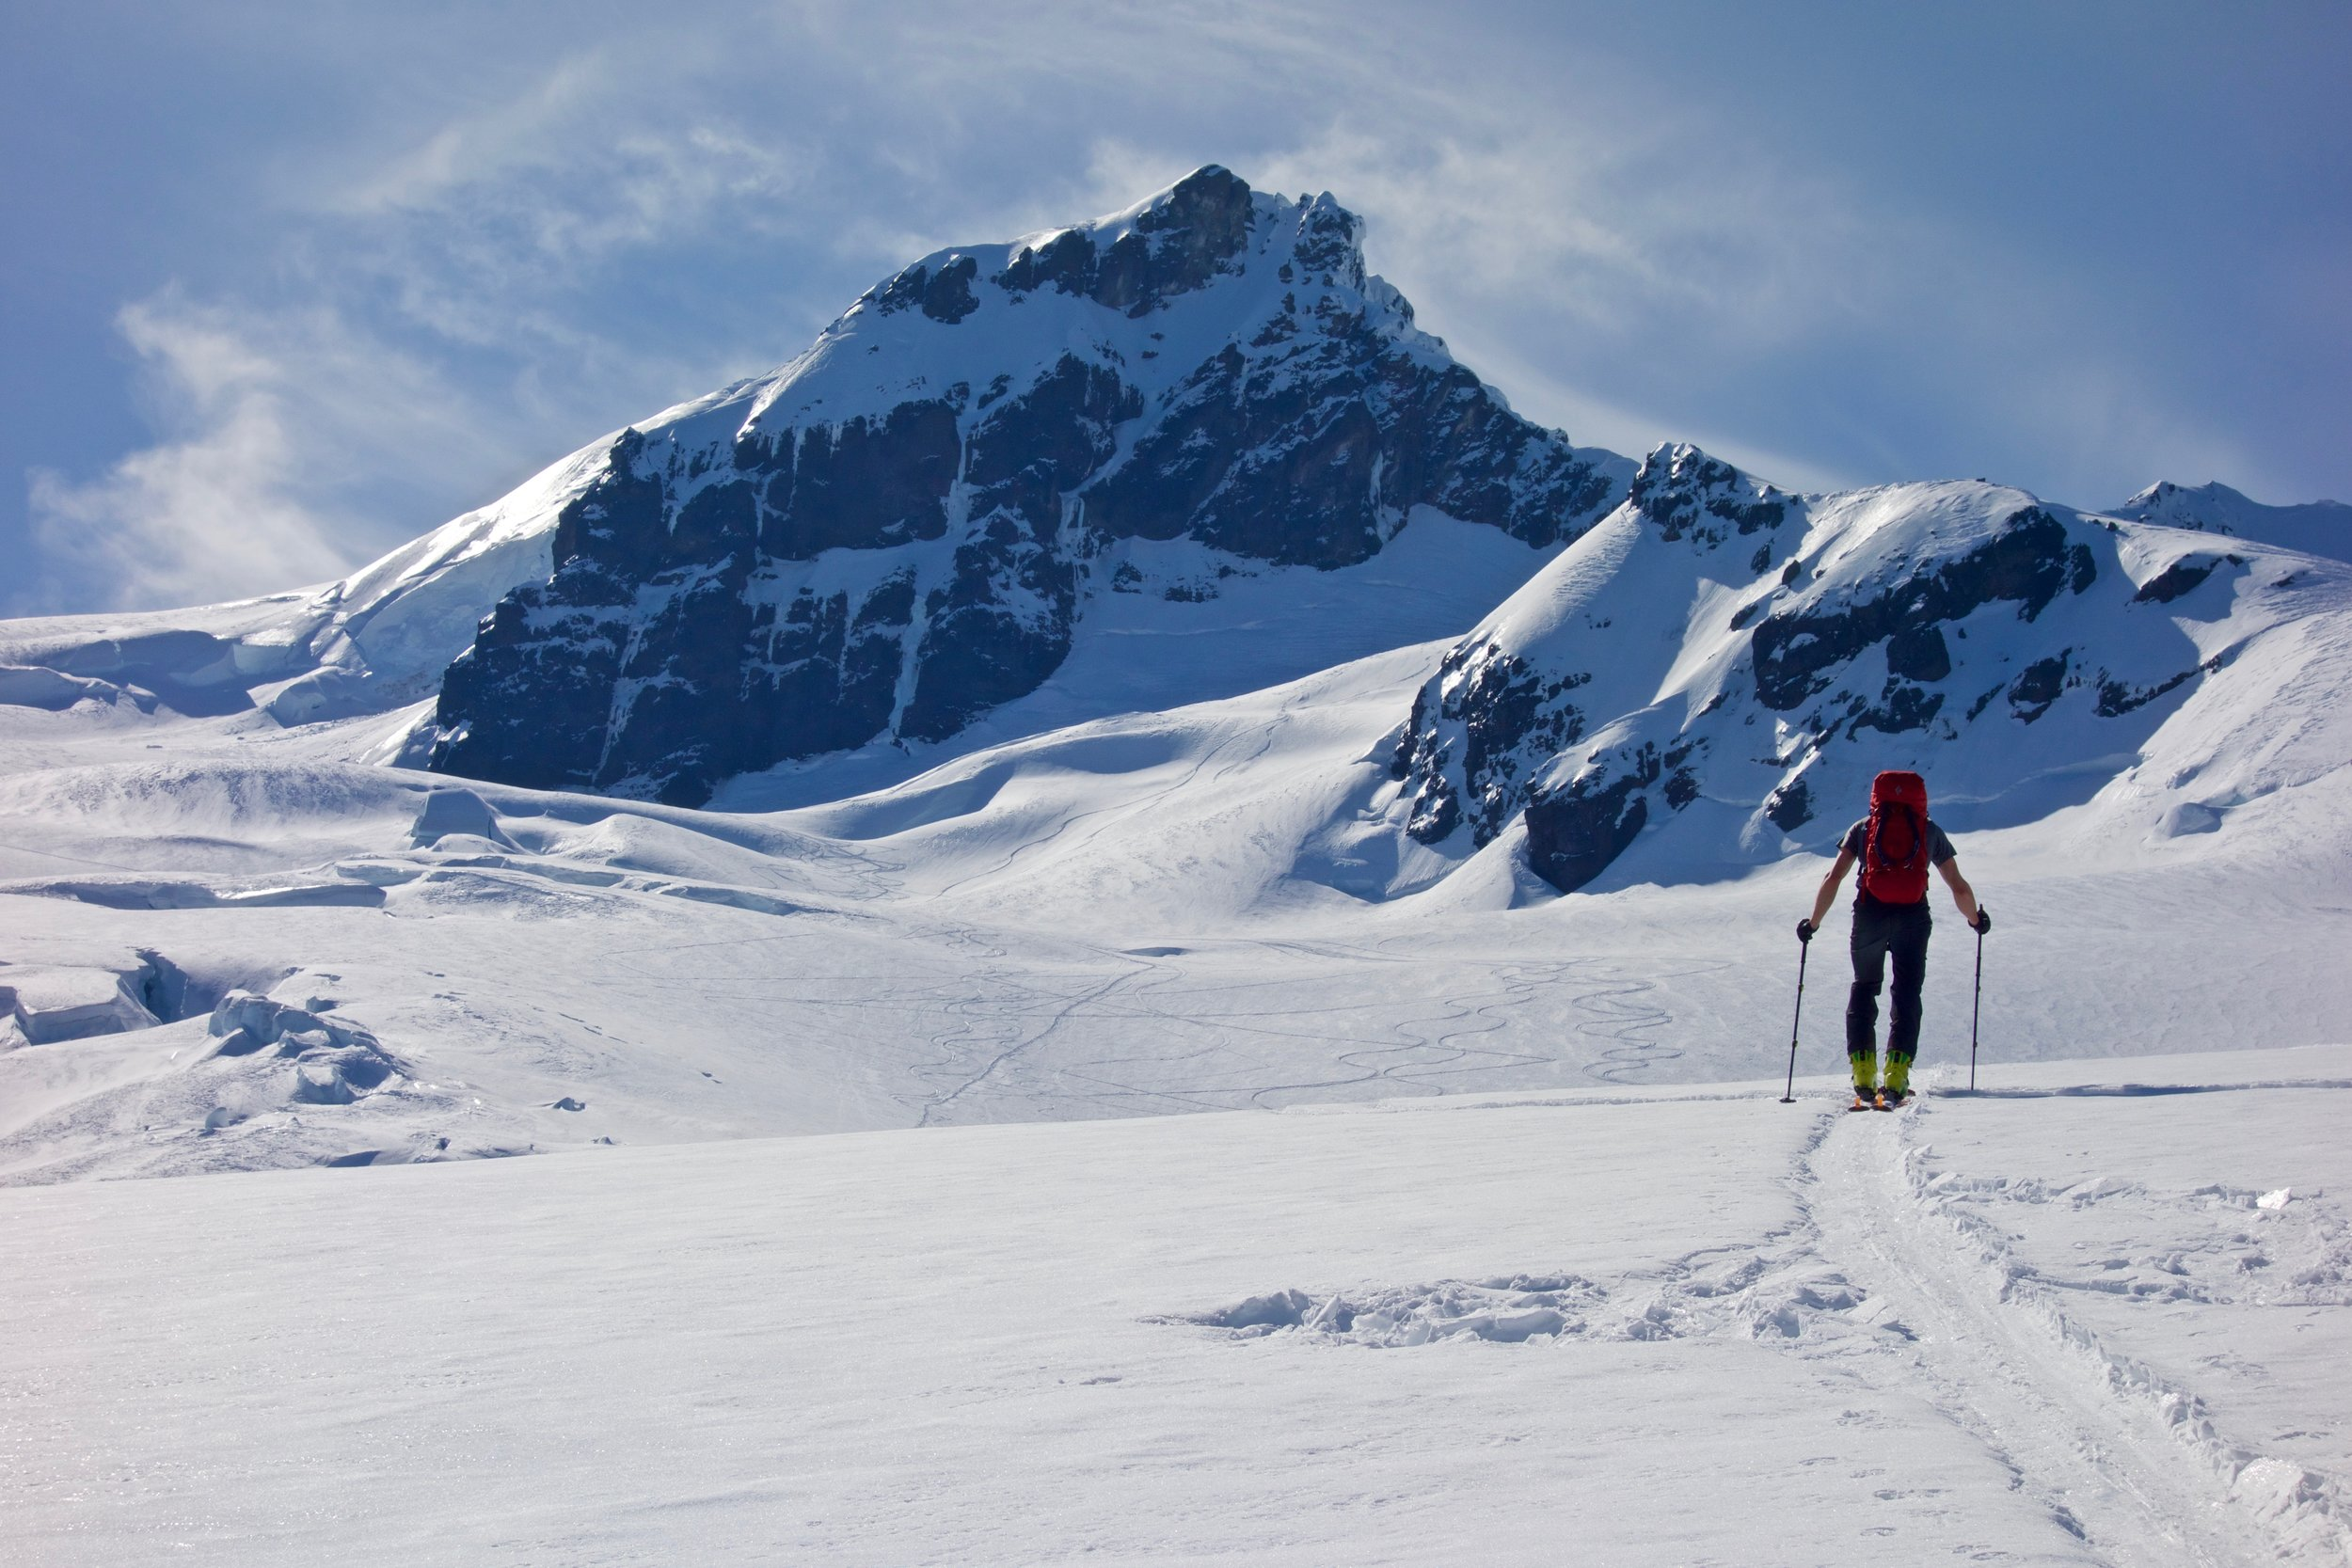 Approaching Colfax Peak. Photo by Dale Apgar.